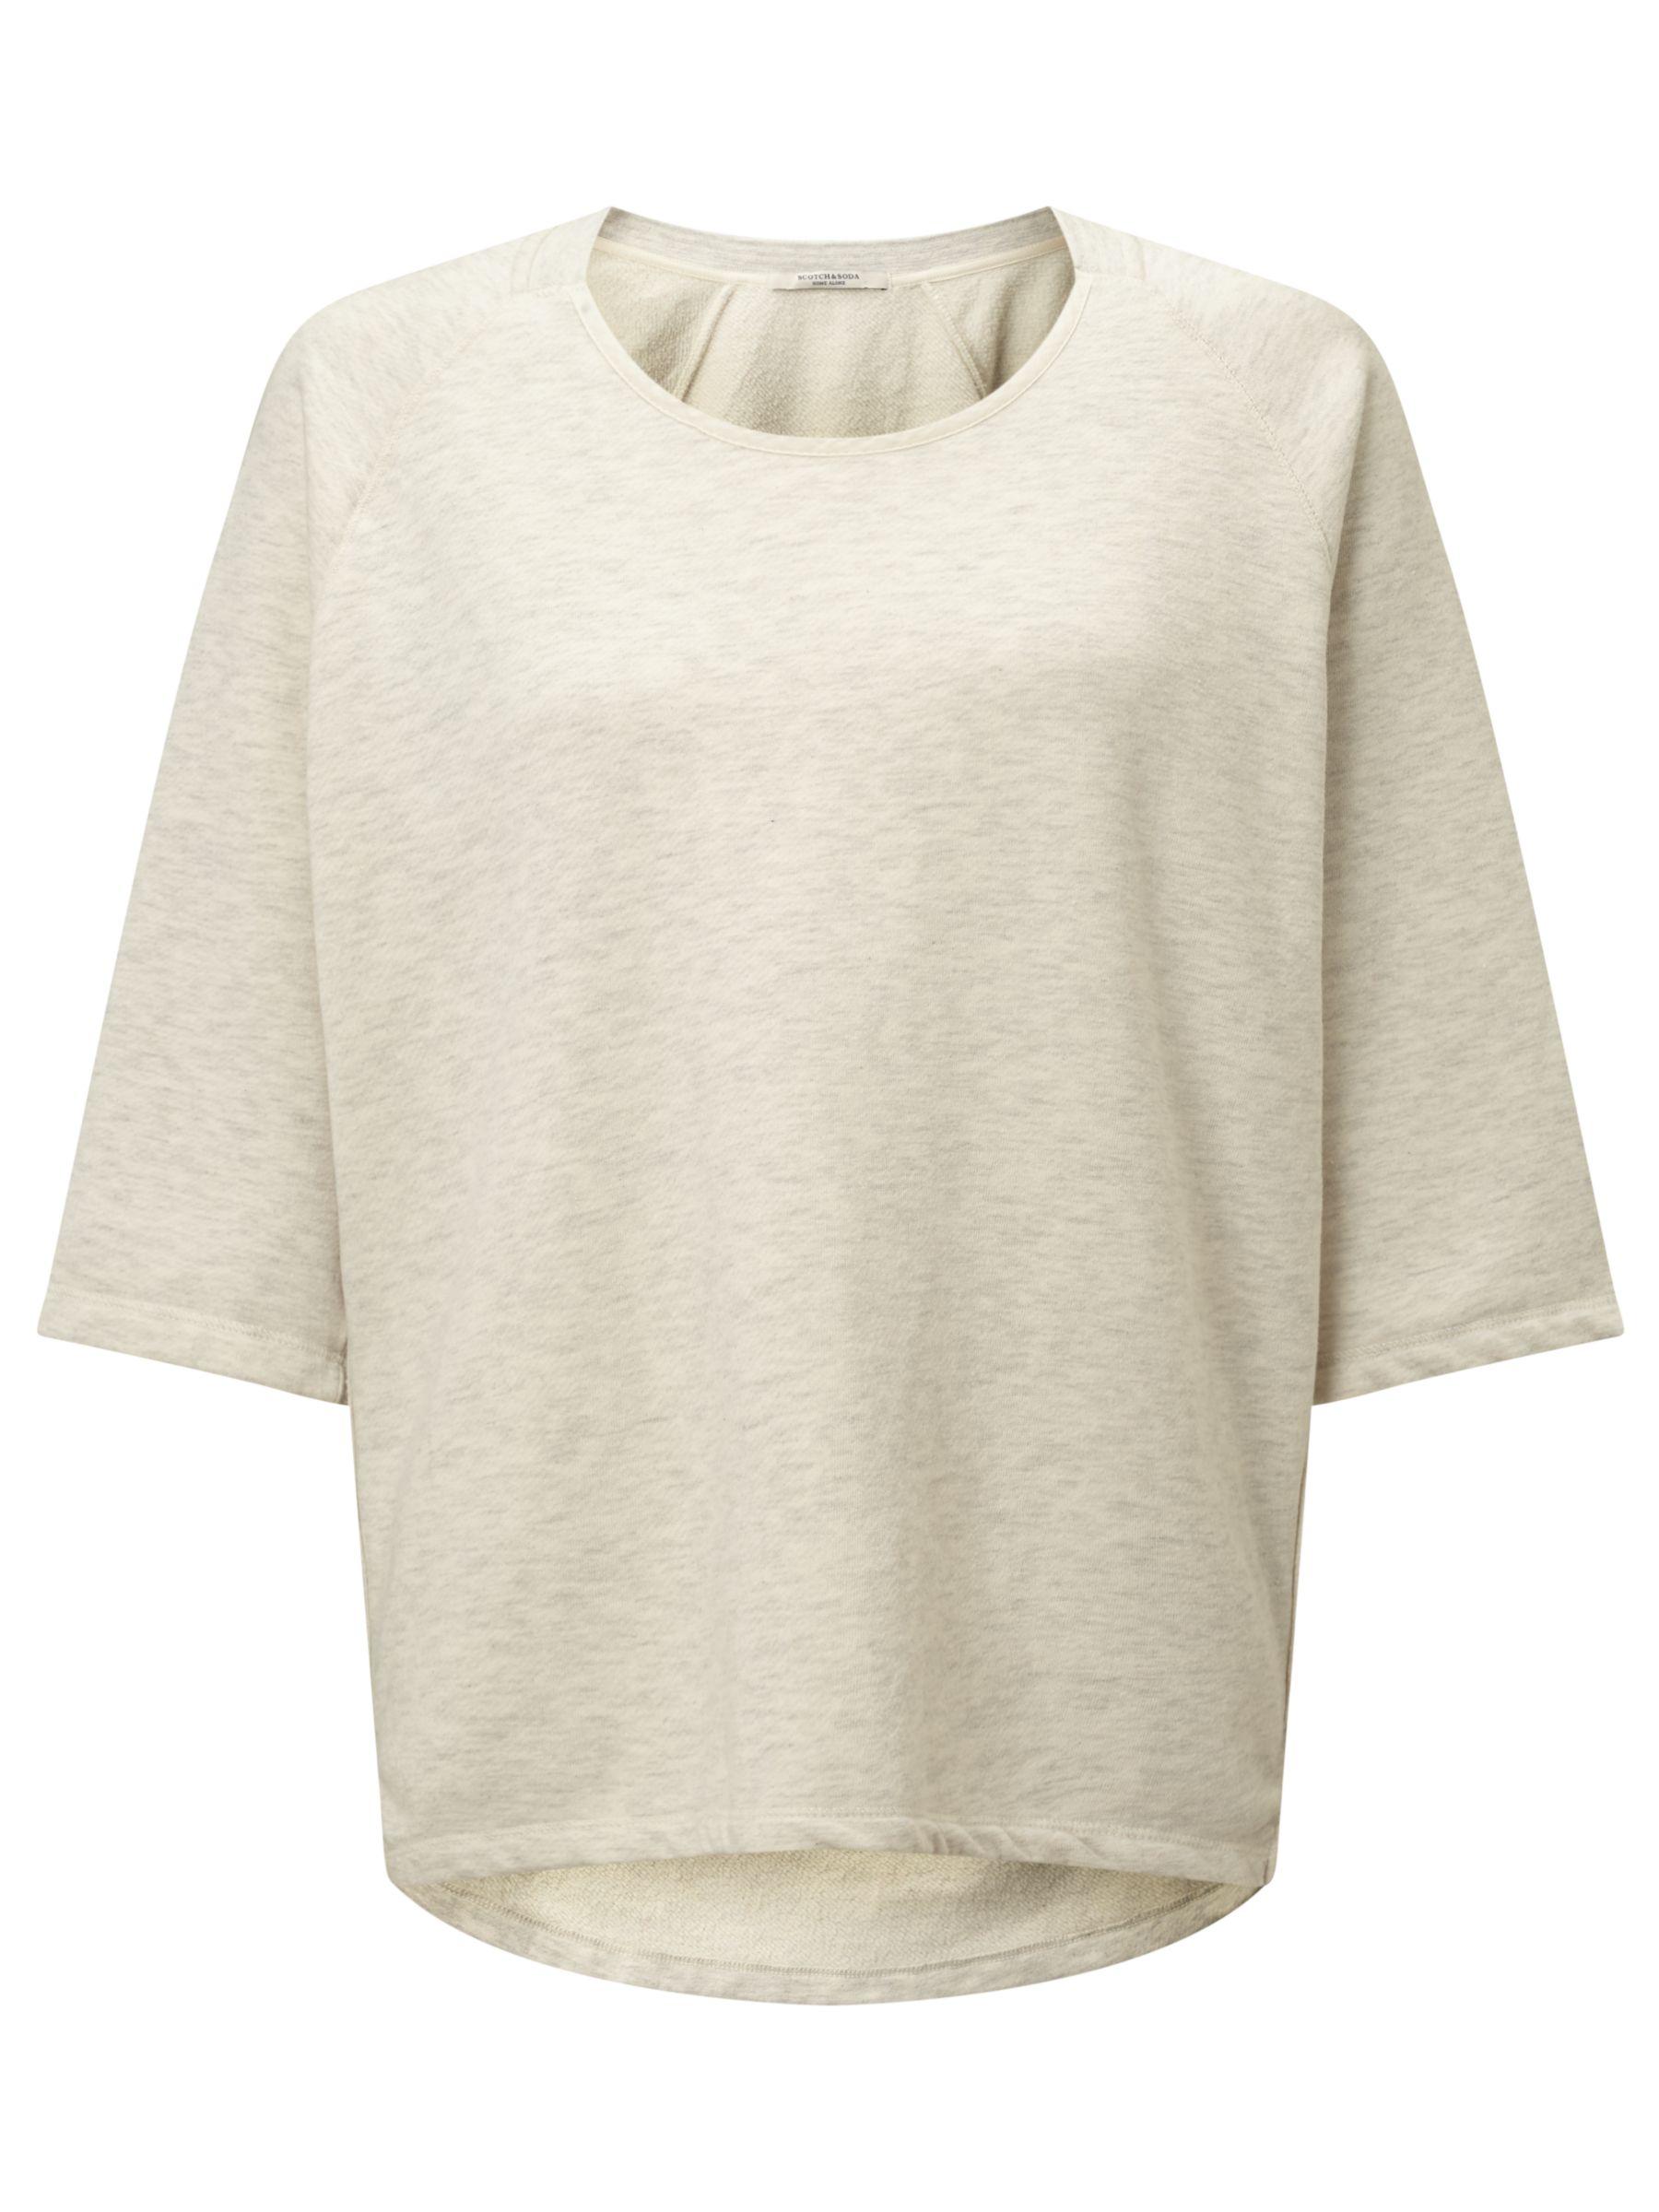 Maison Scotch Maison Scotch Home Alone Loose Fit Sweatshirt, Grey Melange